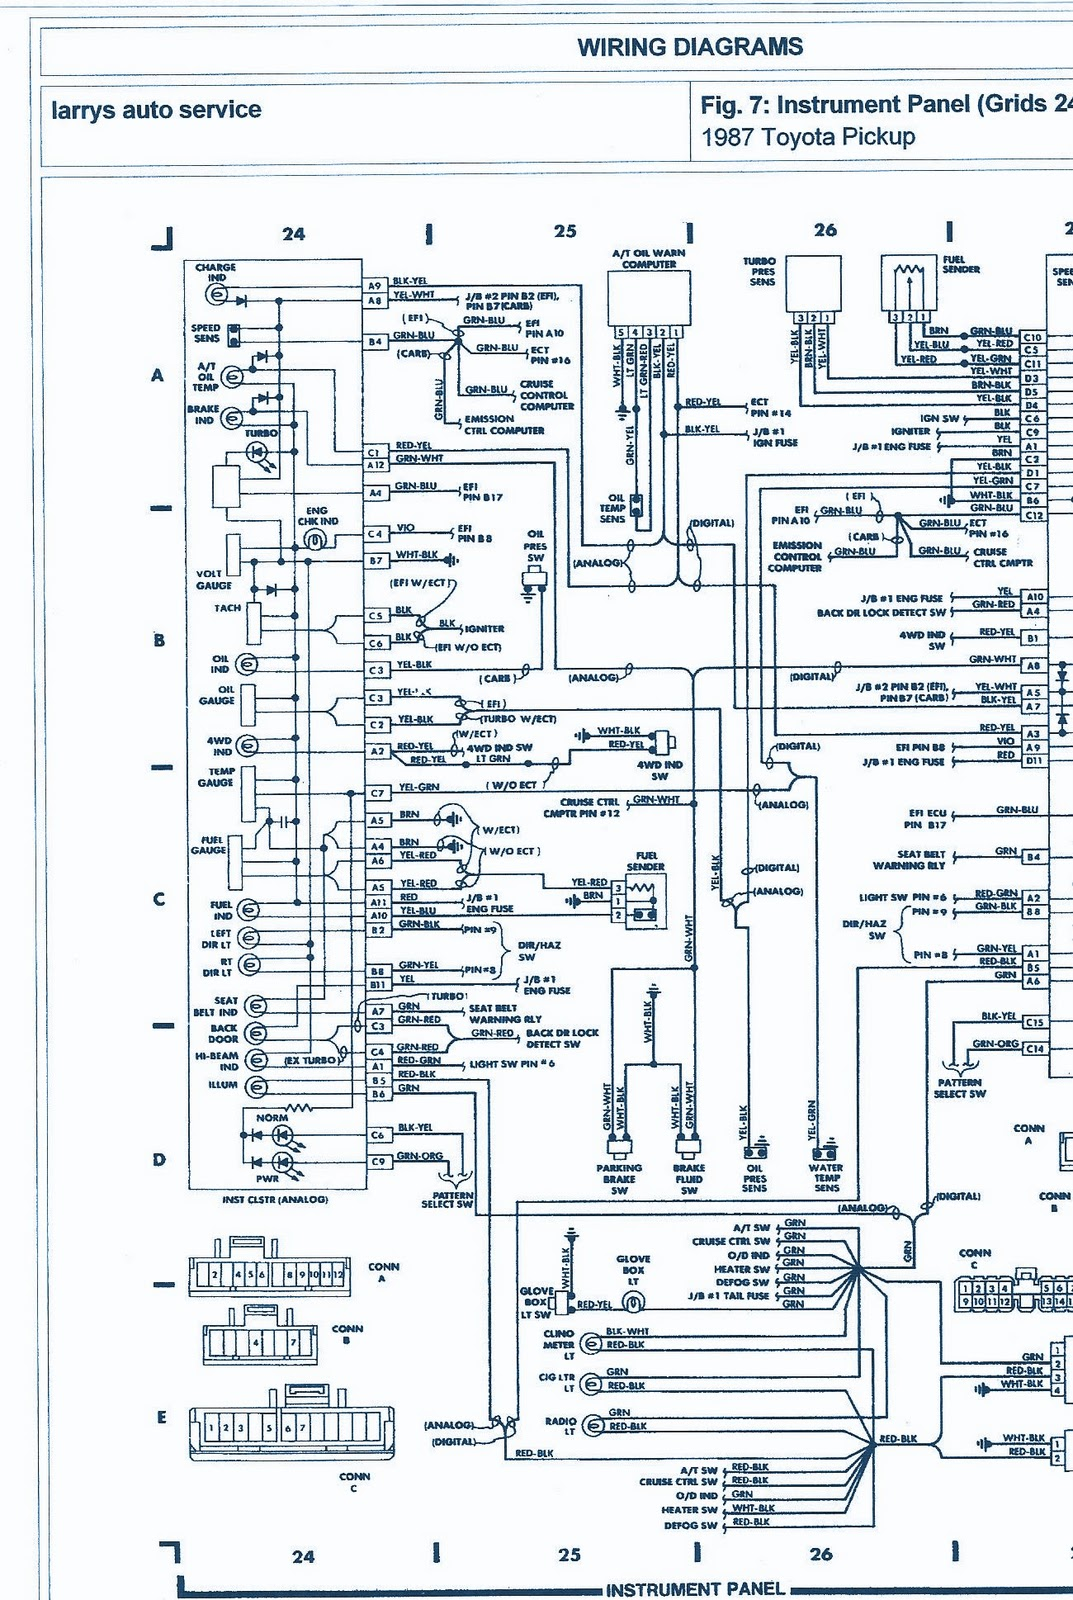 36 Volt Trolling Motor Harness Wiring Diagram Additionally 24